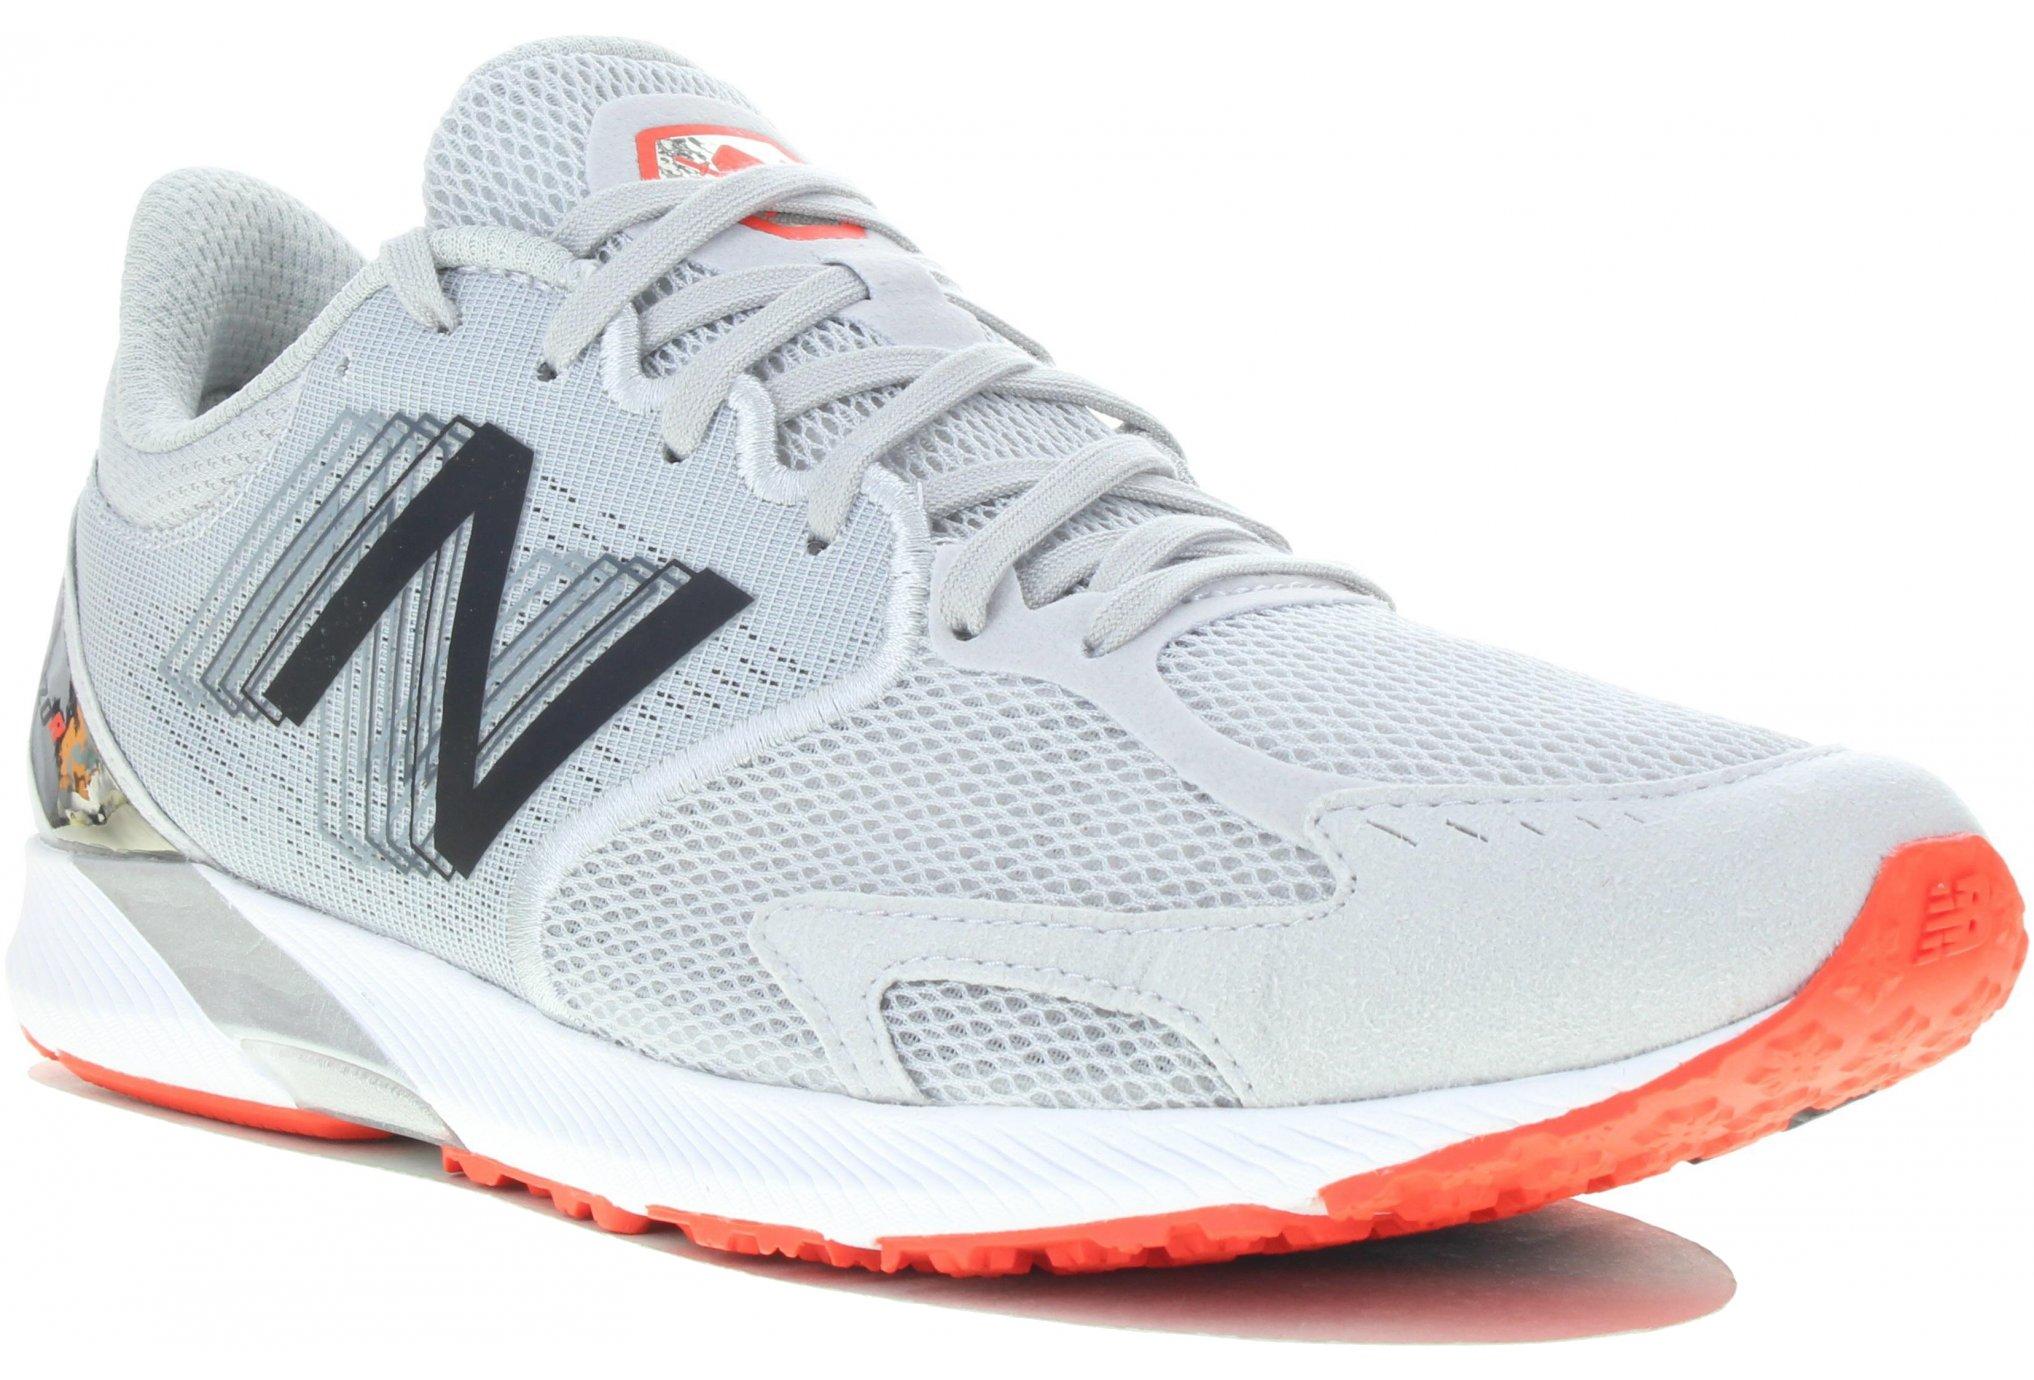 New Balance Hanzo R V3 M Diététique Chaussures homme